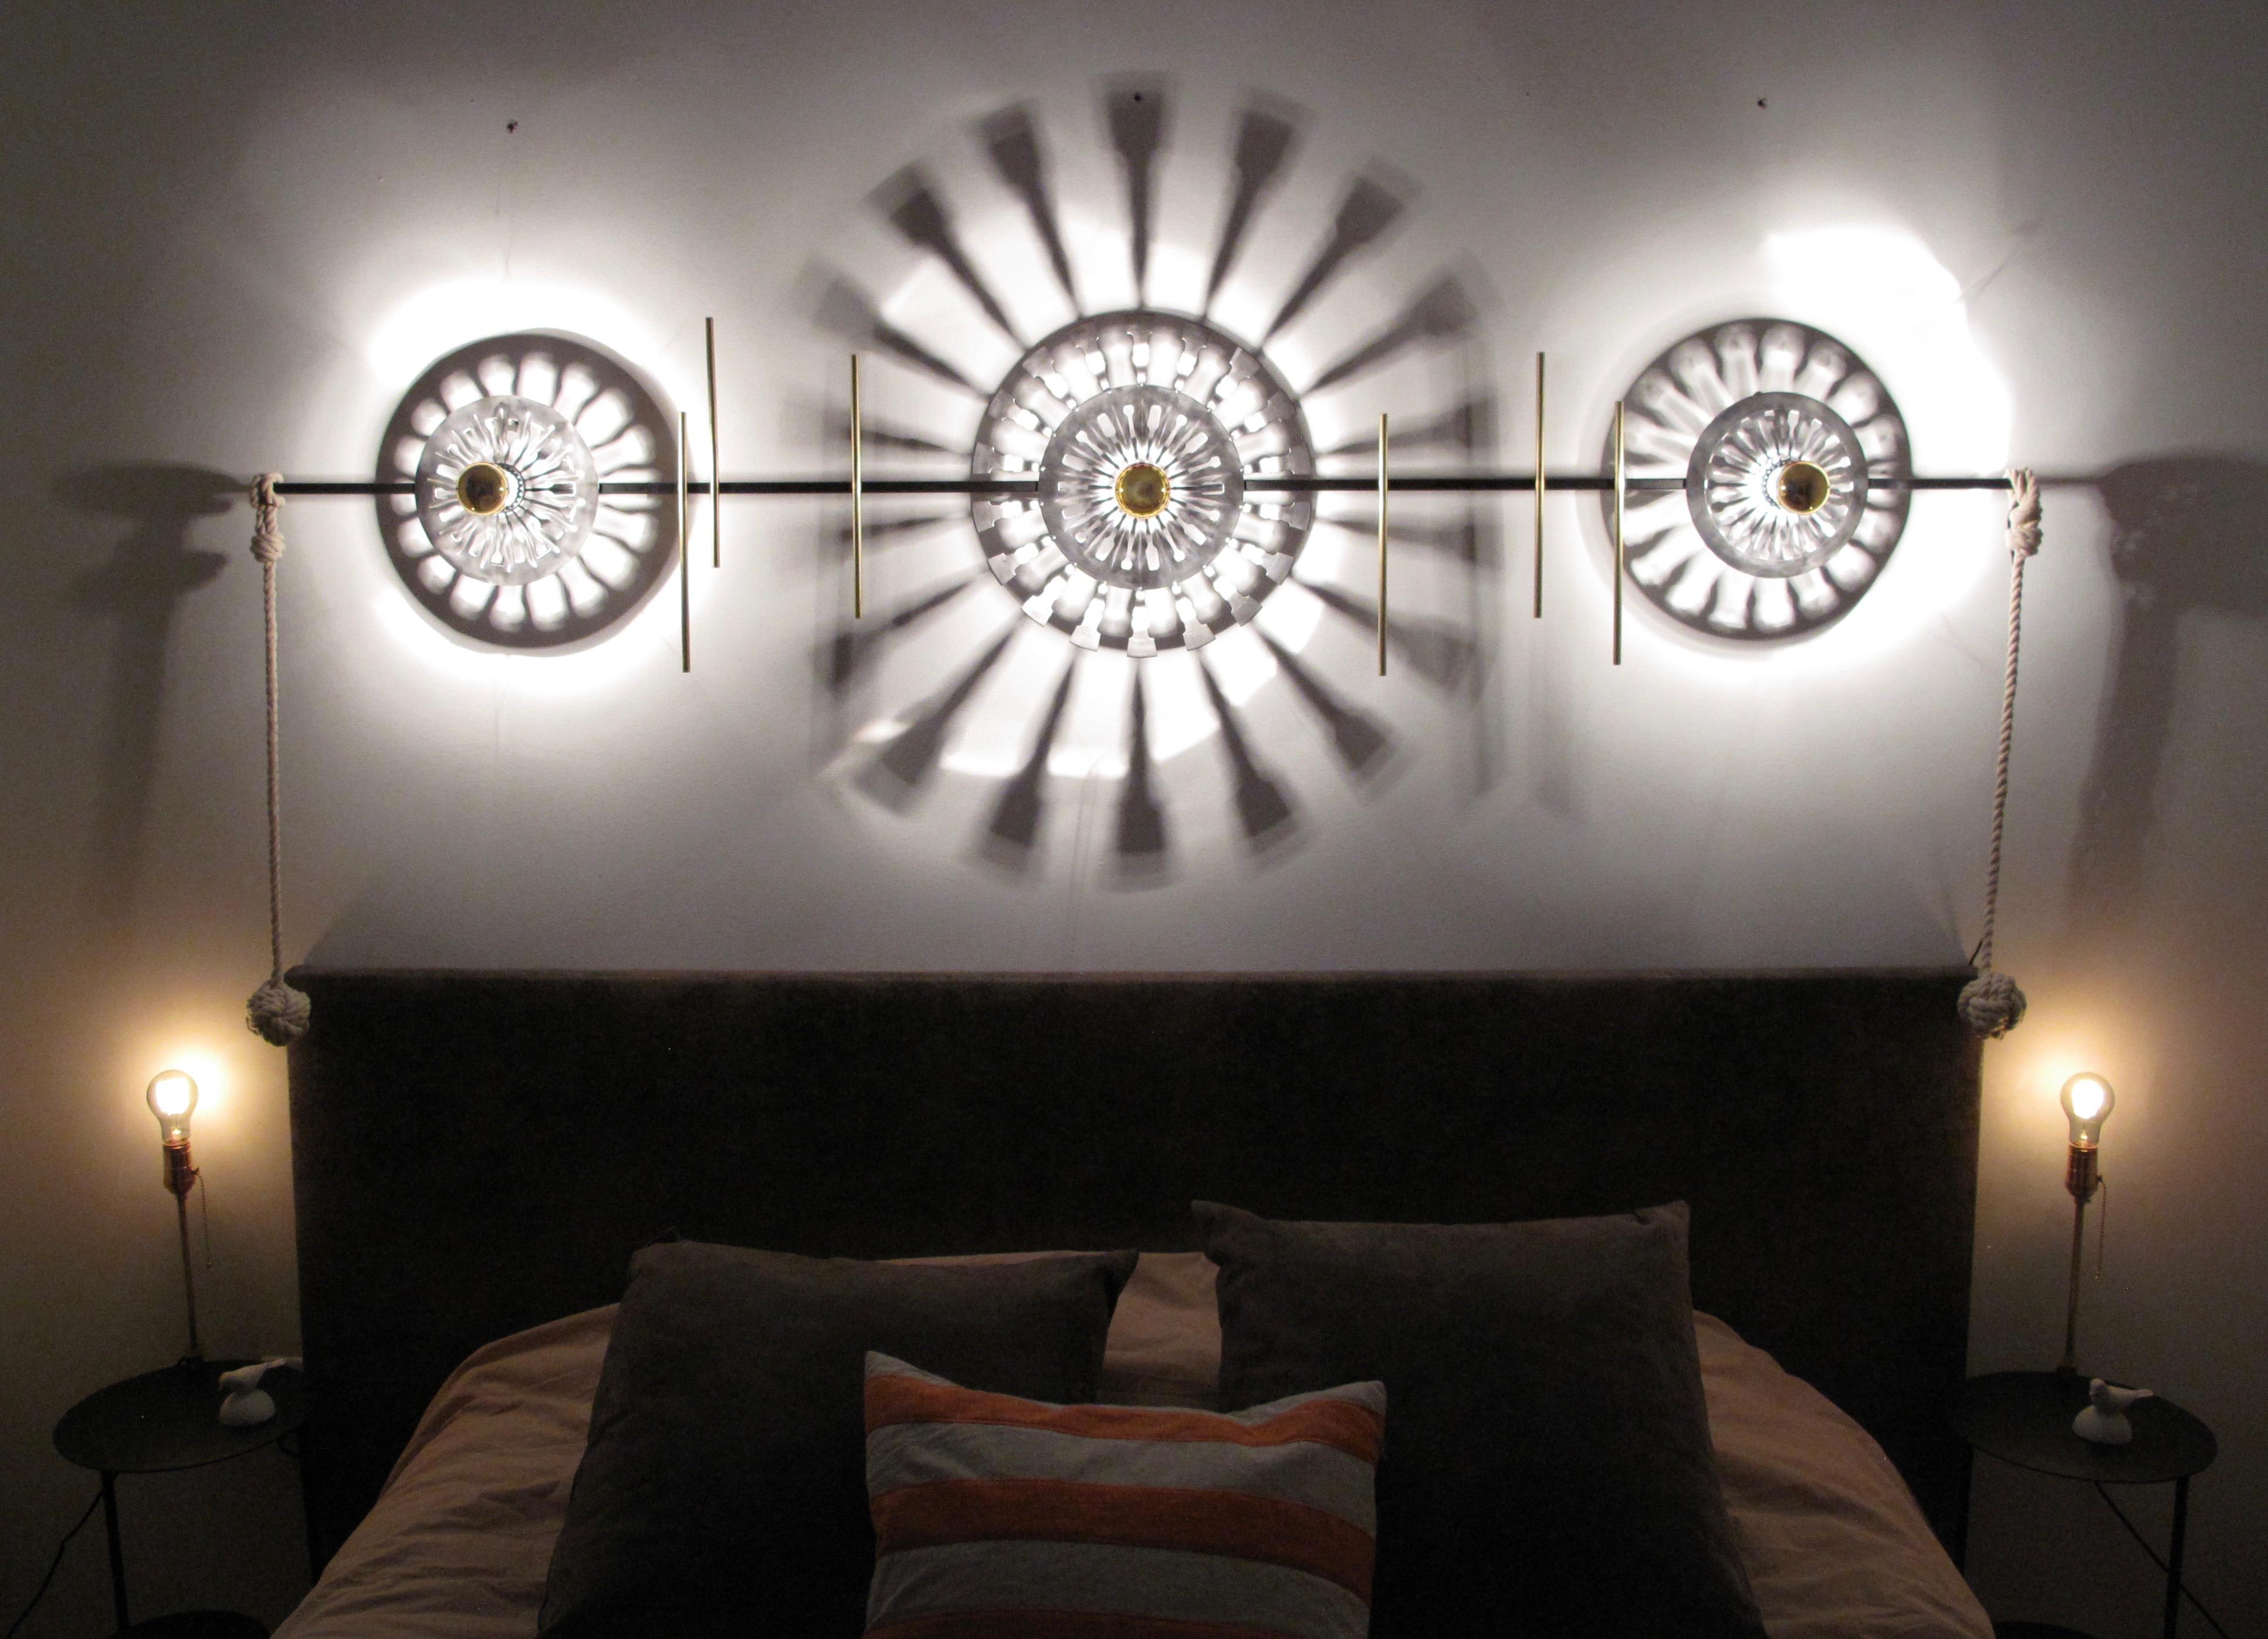 Music sheet lamp & round bedsides